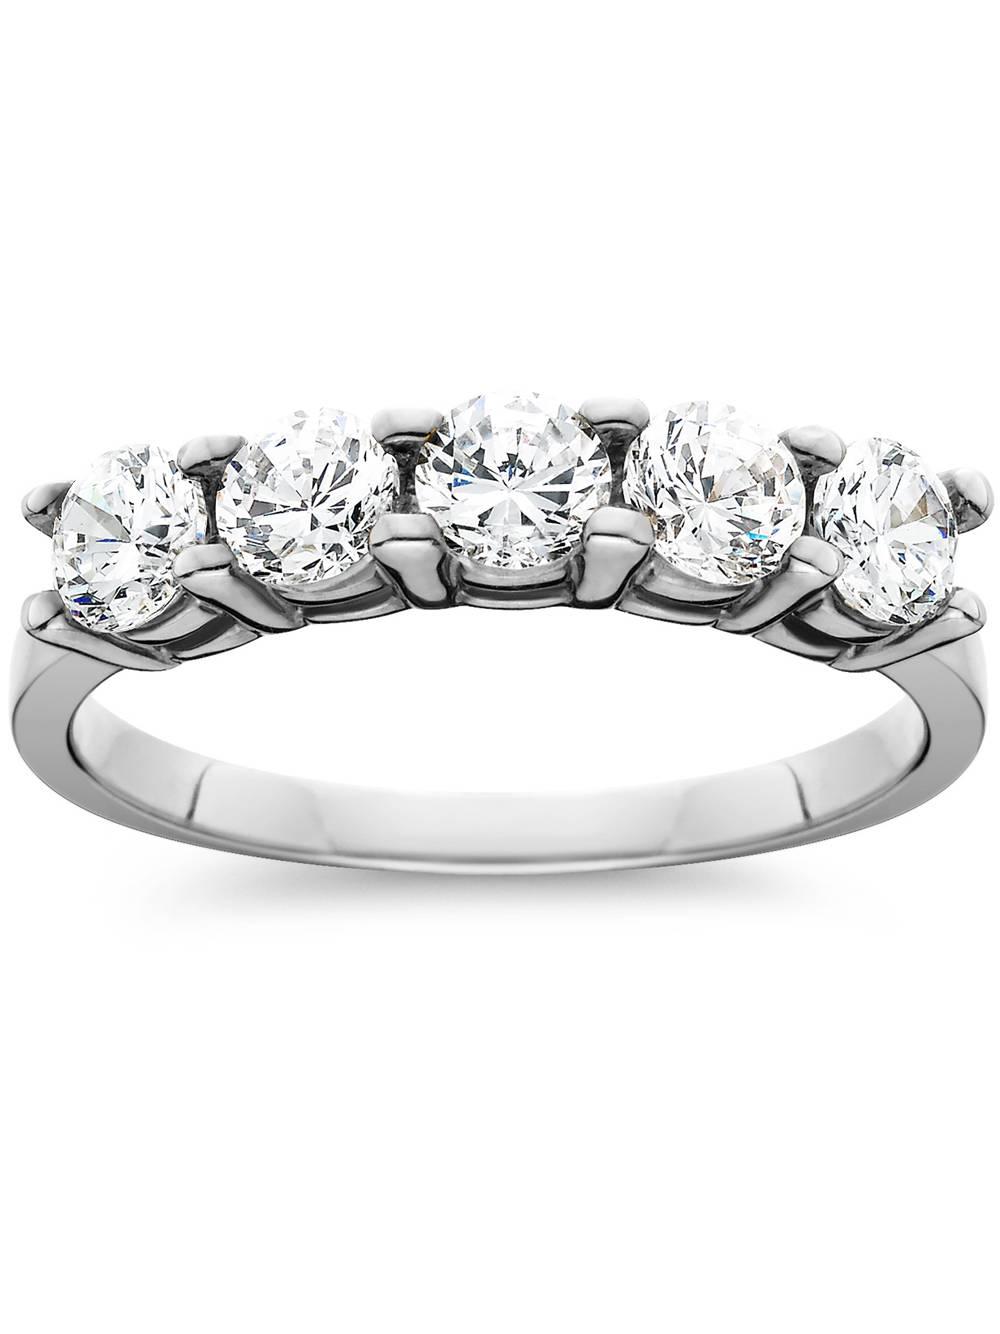 Pompeii3 1ct Five Stone Genuine Round Diamond Wedding Anniversary Ring 14K White Gold